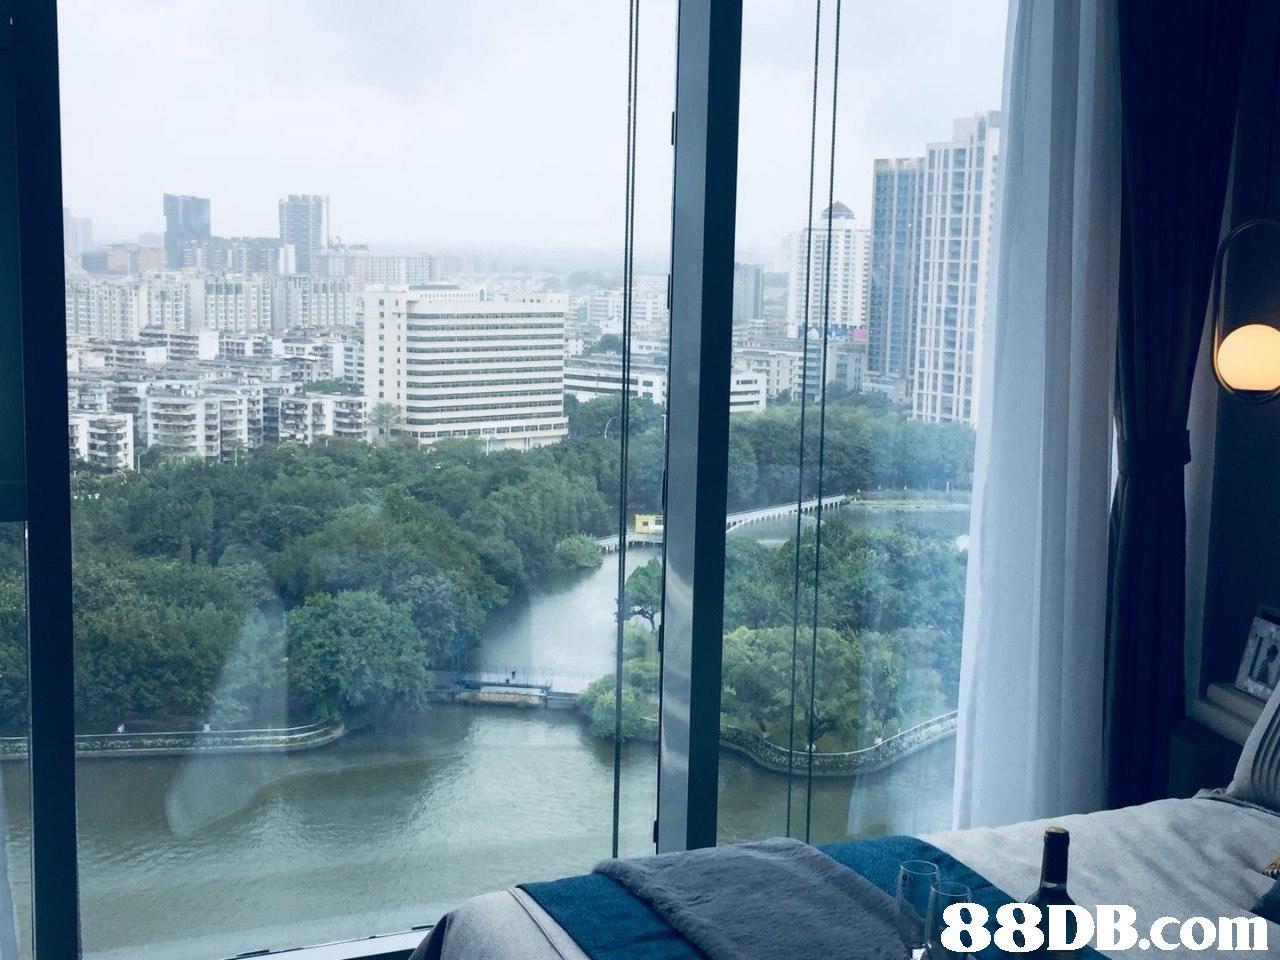 property,condominium,building,skyscraper,window